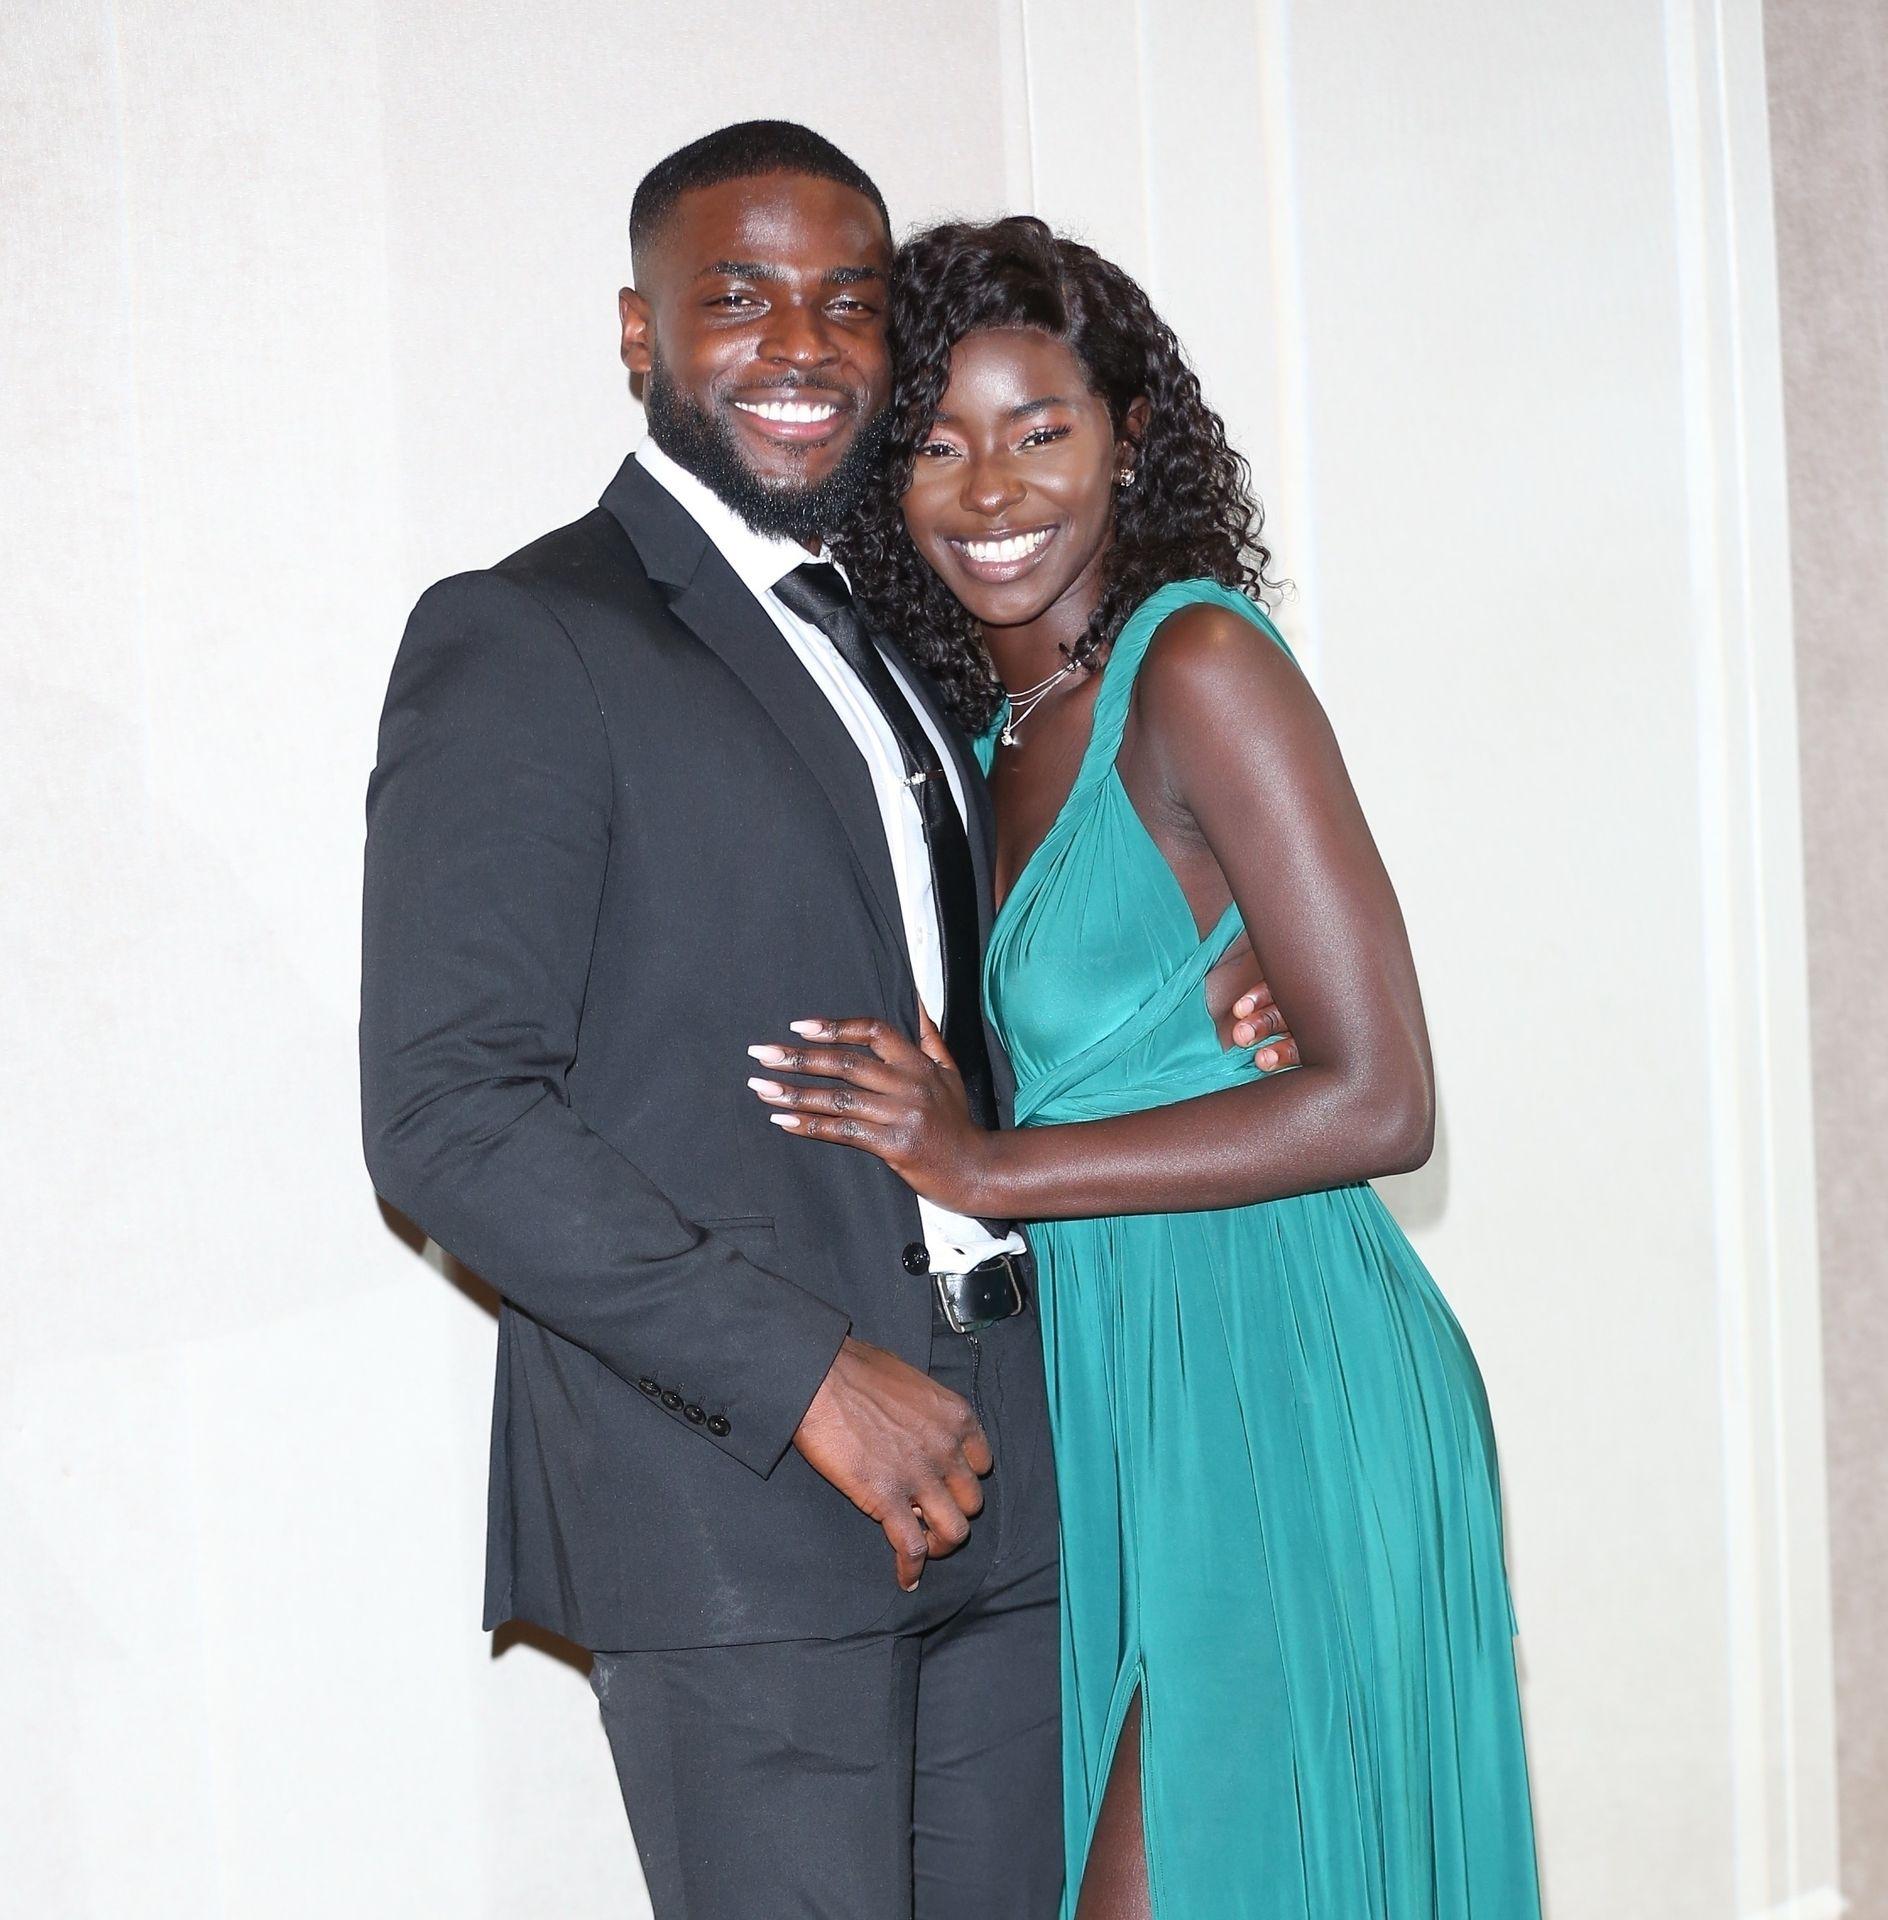 Mike Boateng & Priscilla Anyabu Are Seen At British Ethnic Diversity Sports Awards 0129